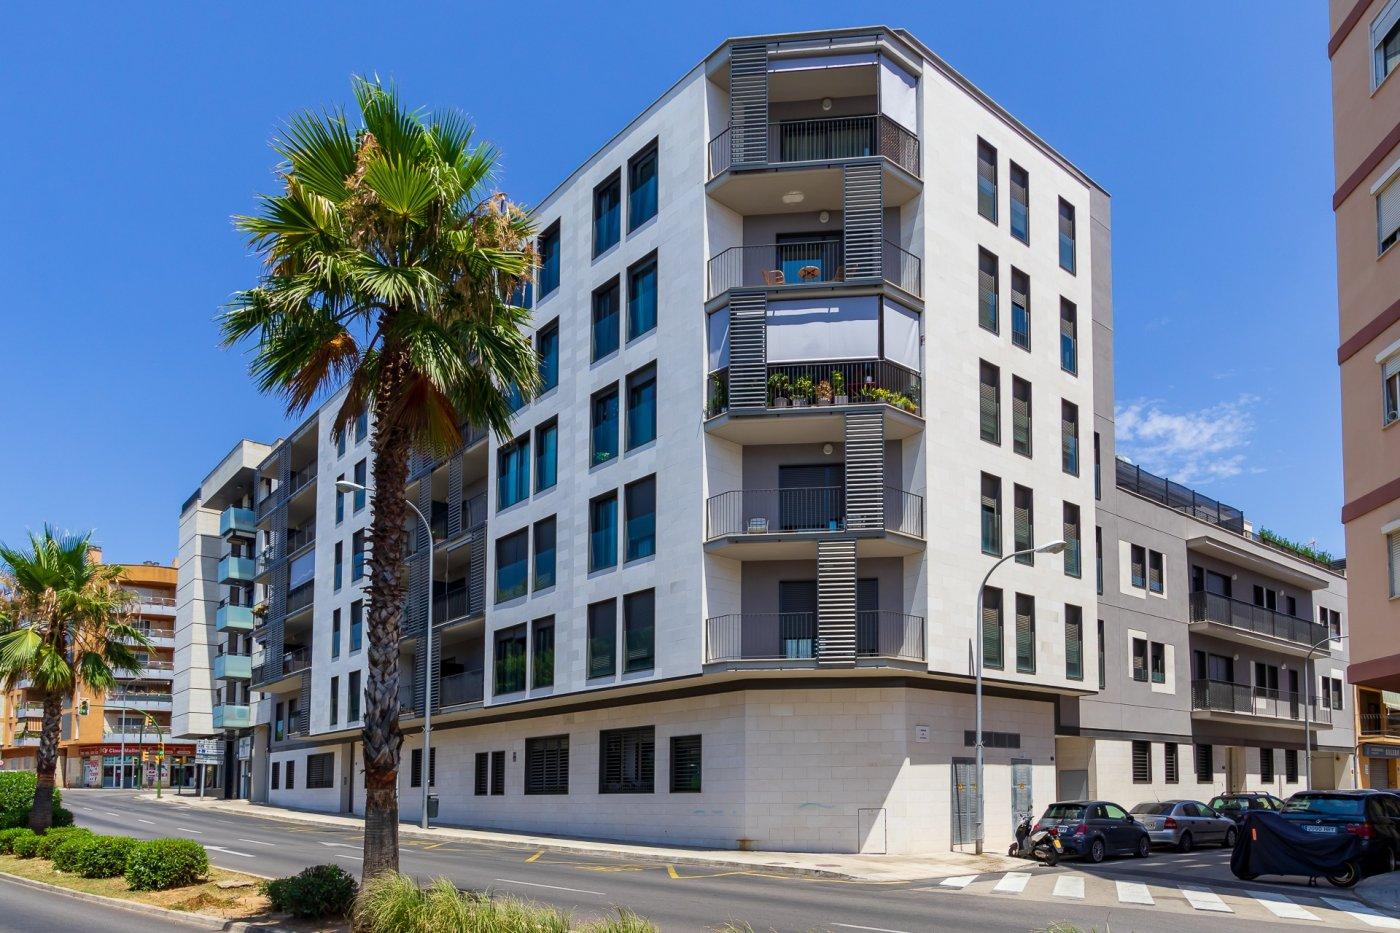 Importante bajada de precio en Cas Capiscol, Palma de Mallorca